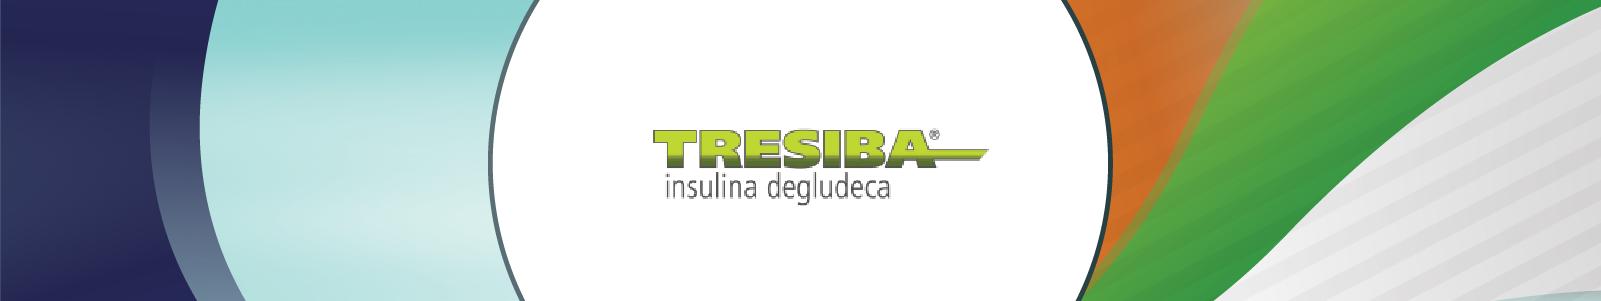 ETED2021-banner-NN-Tresiba